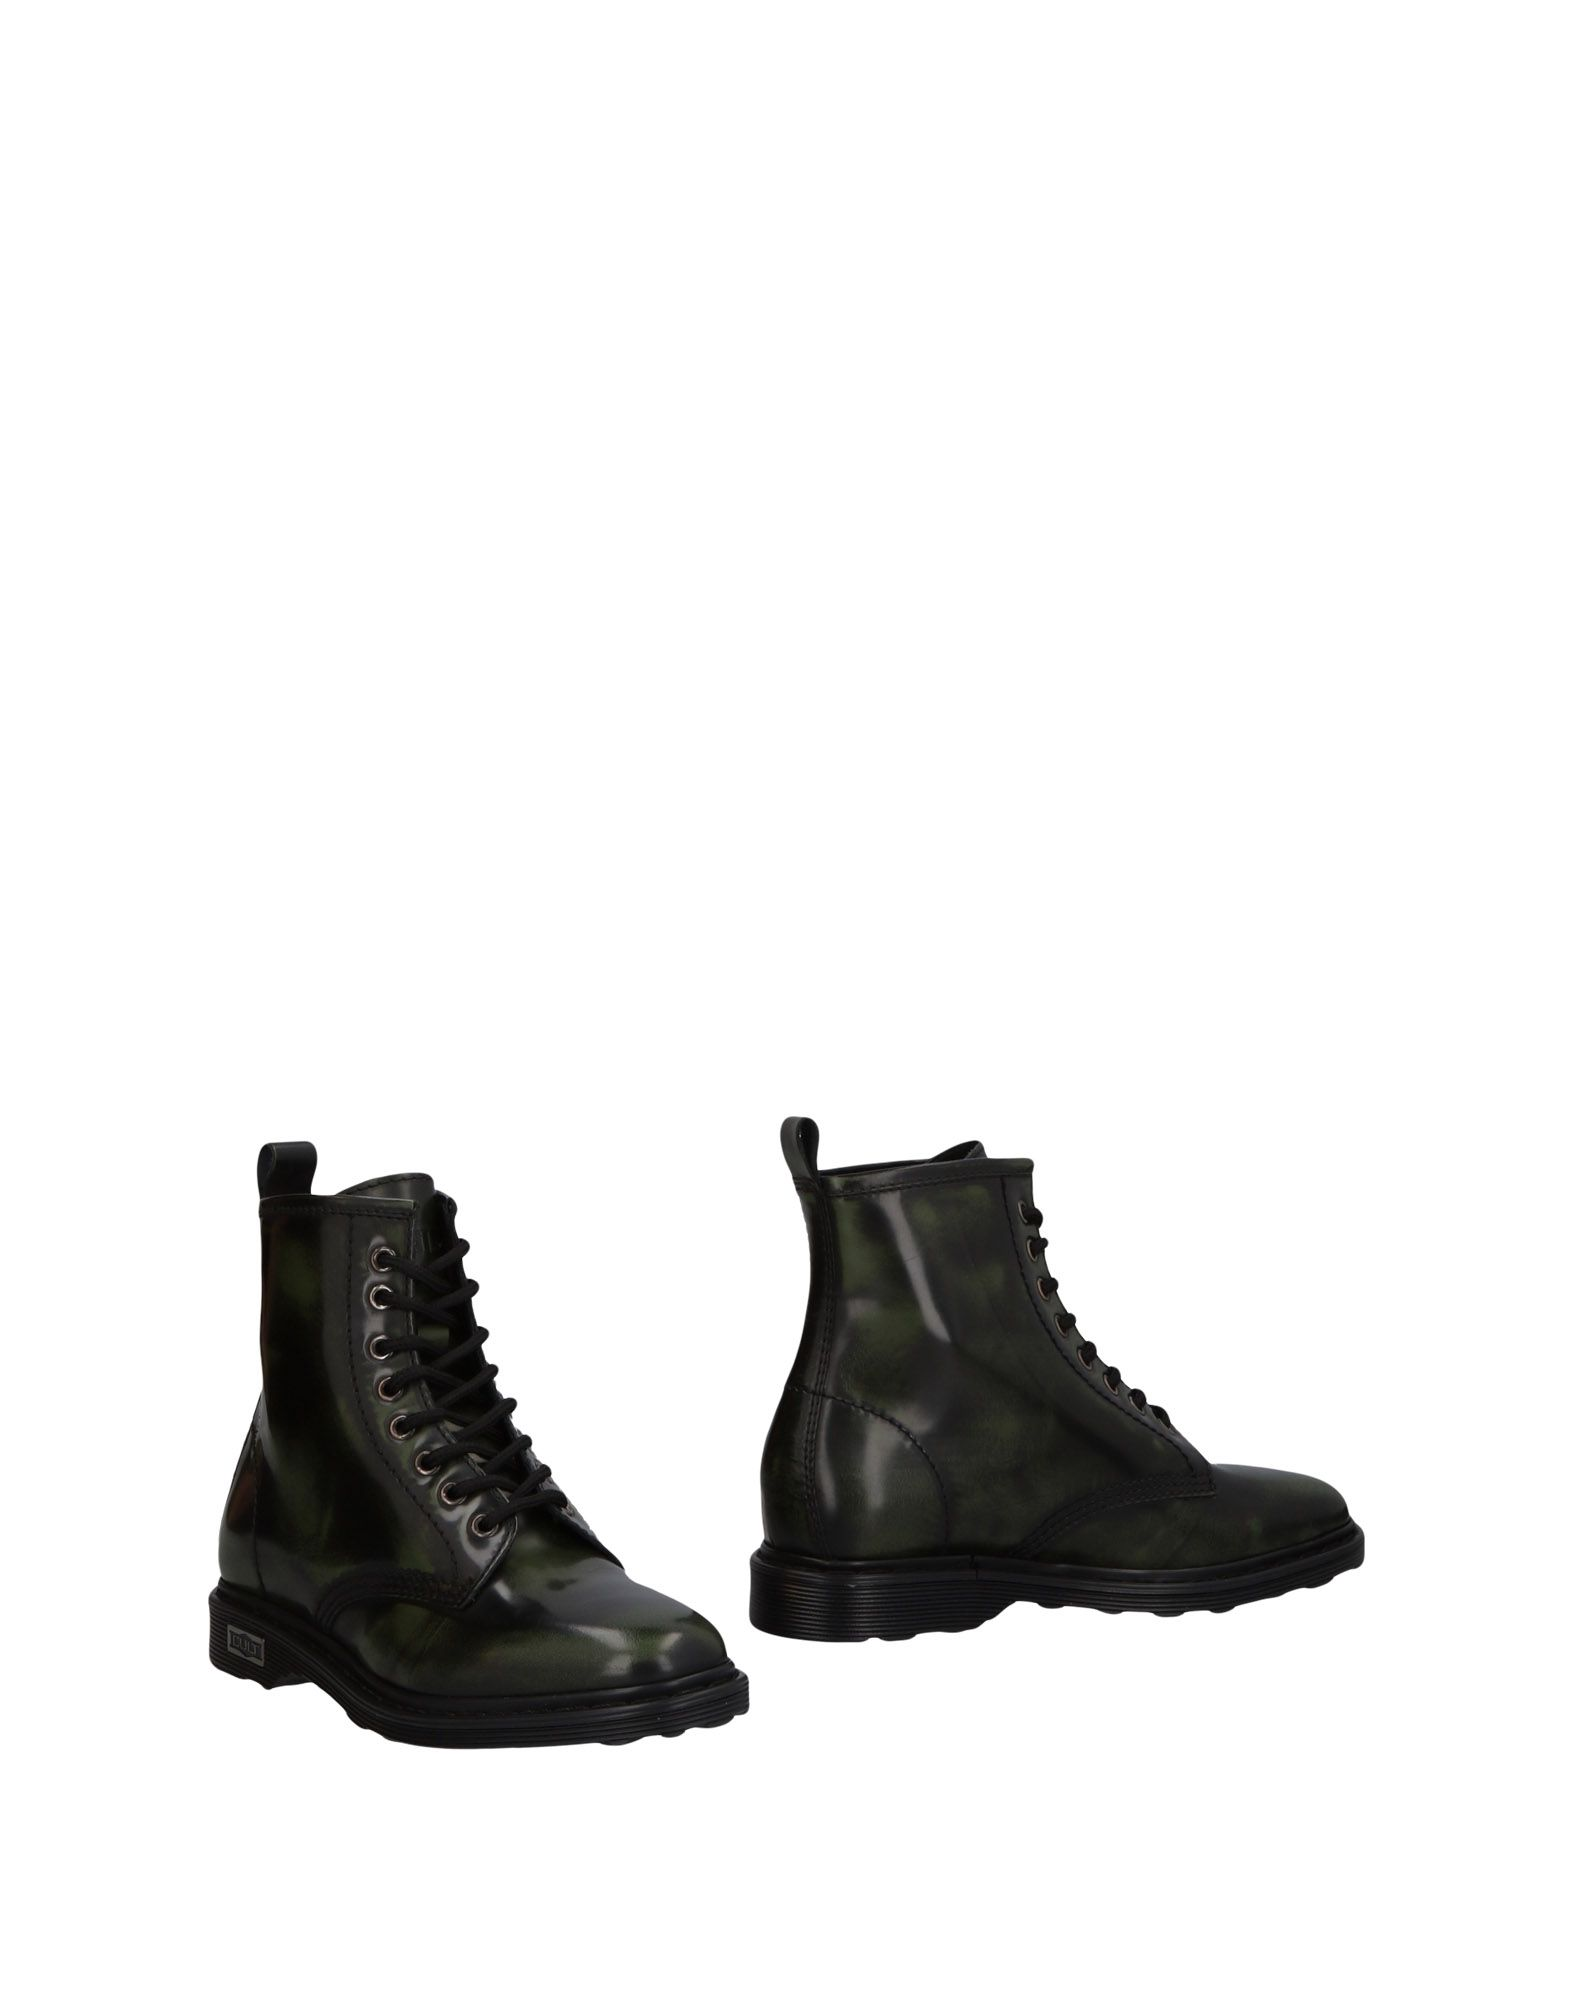 Cult Stiefelette Damen beliebte  11474761UE Gute Qualität beliebte Damen Schuhe 1fa12e